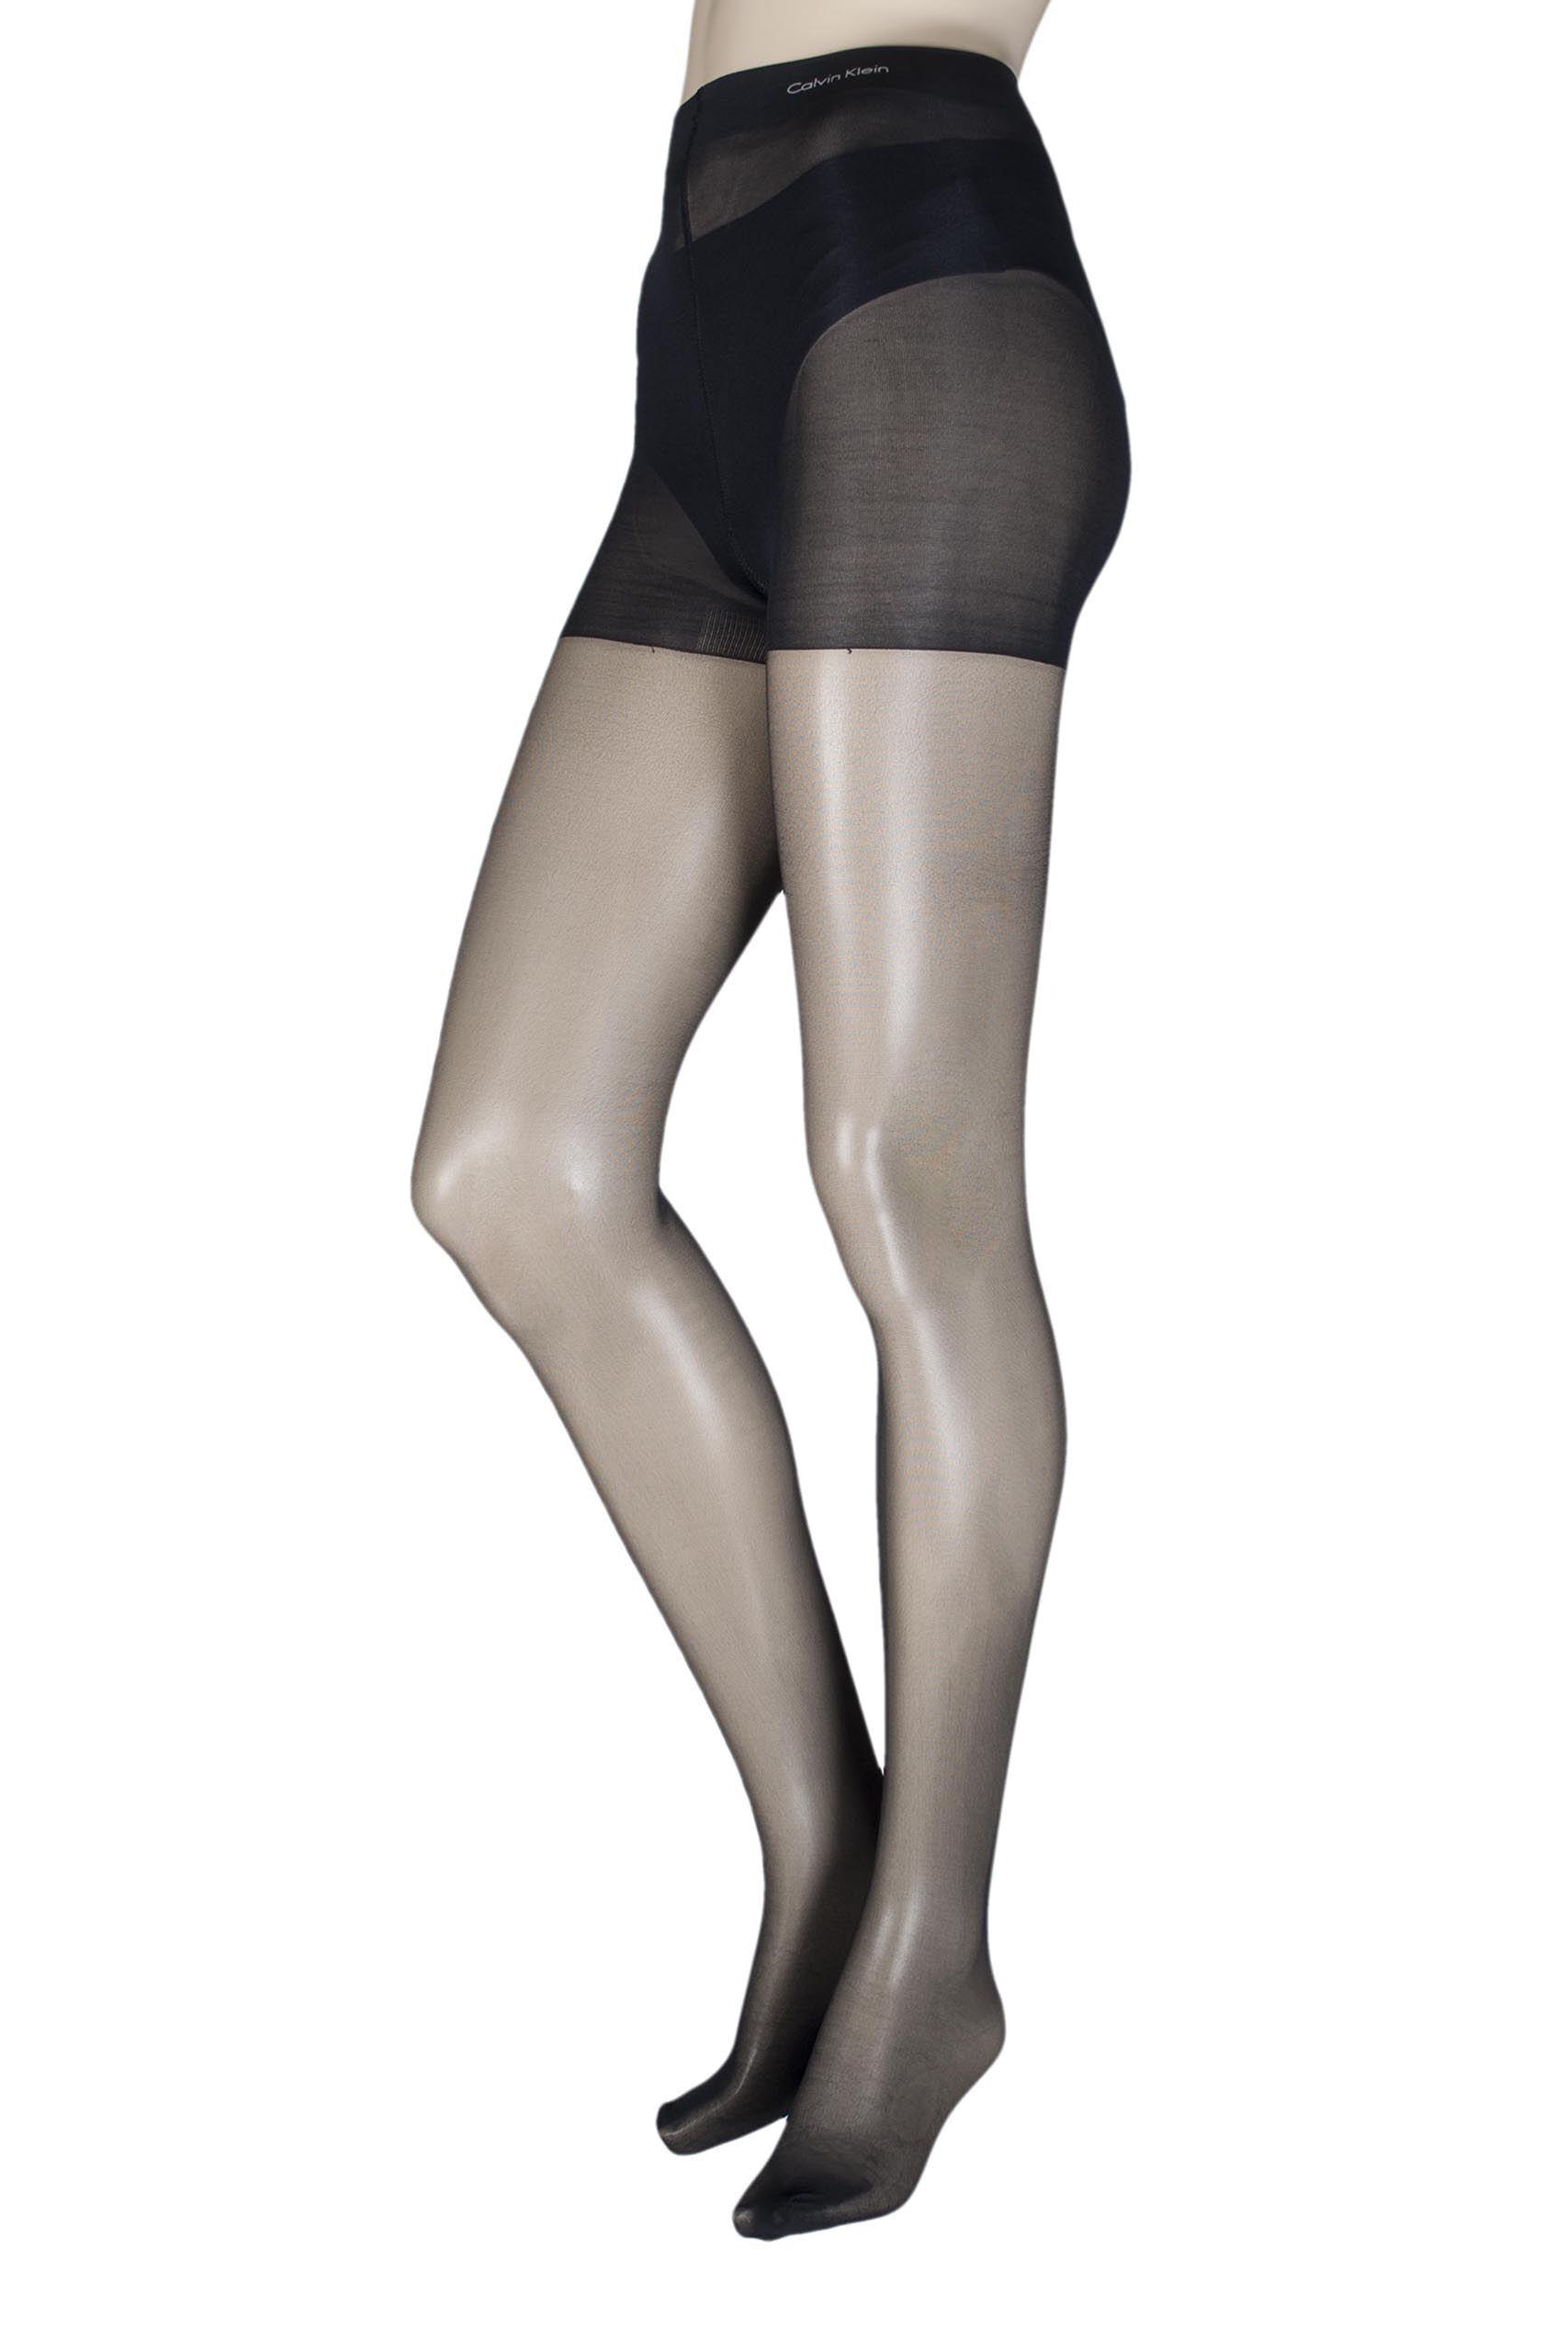 Image of 1 Pair Black Sheer Essentials 15 Denier Tights Ladies Small - Calvin Klein